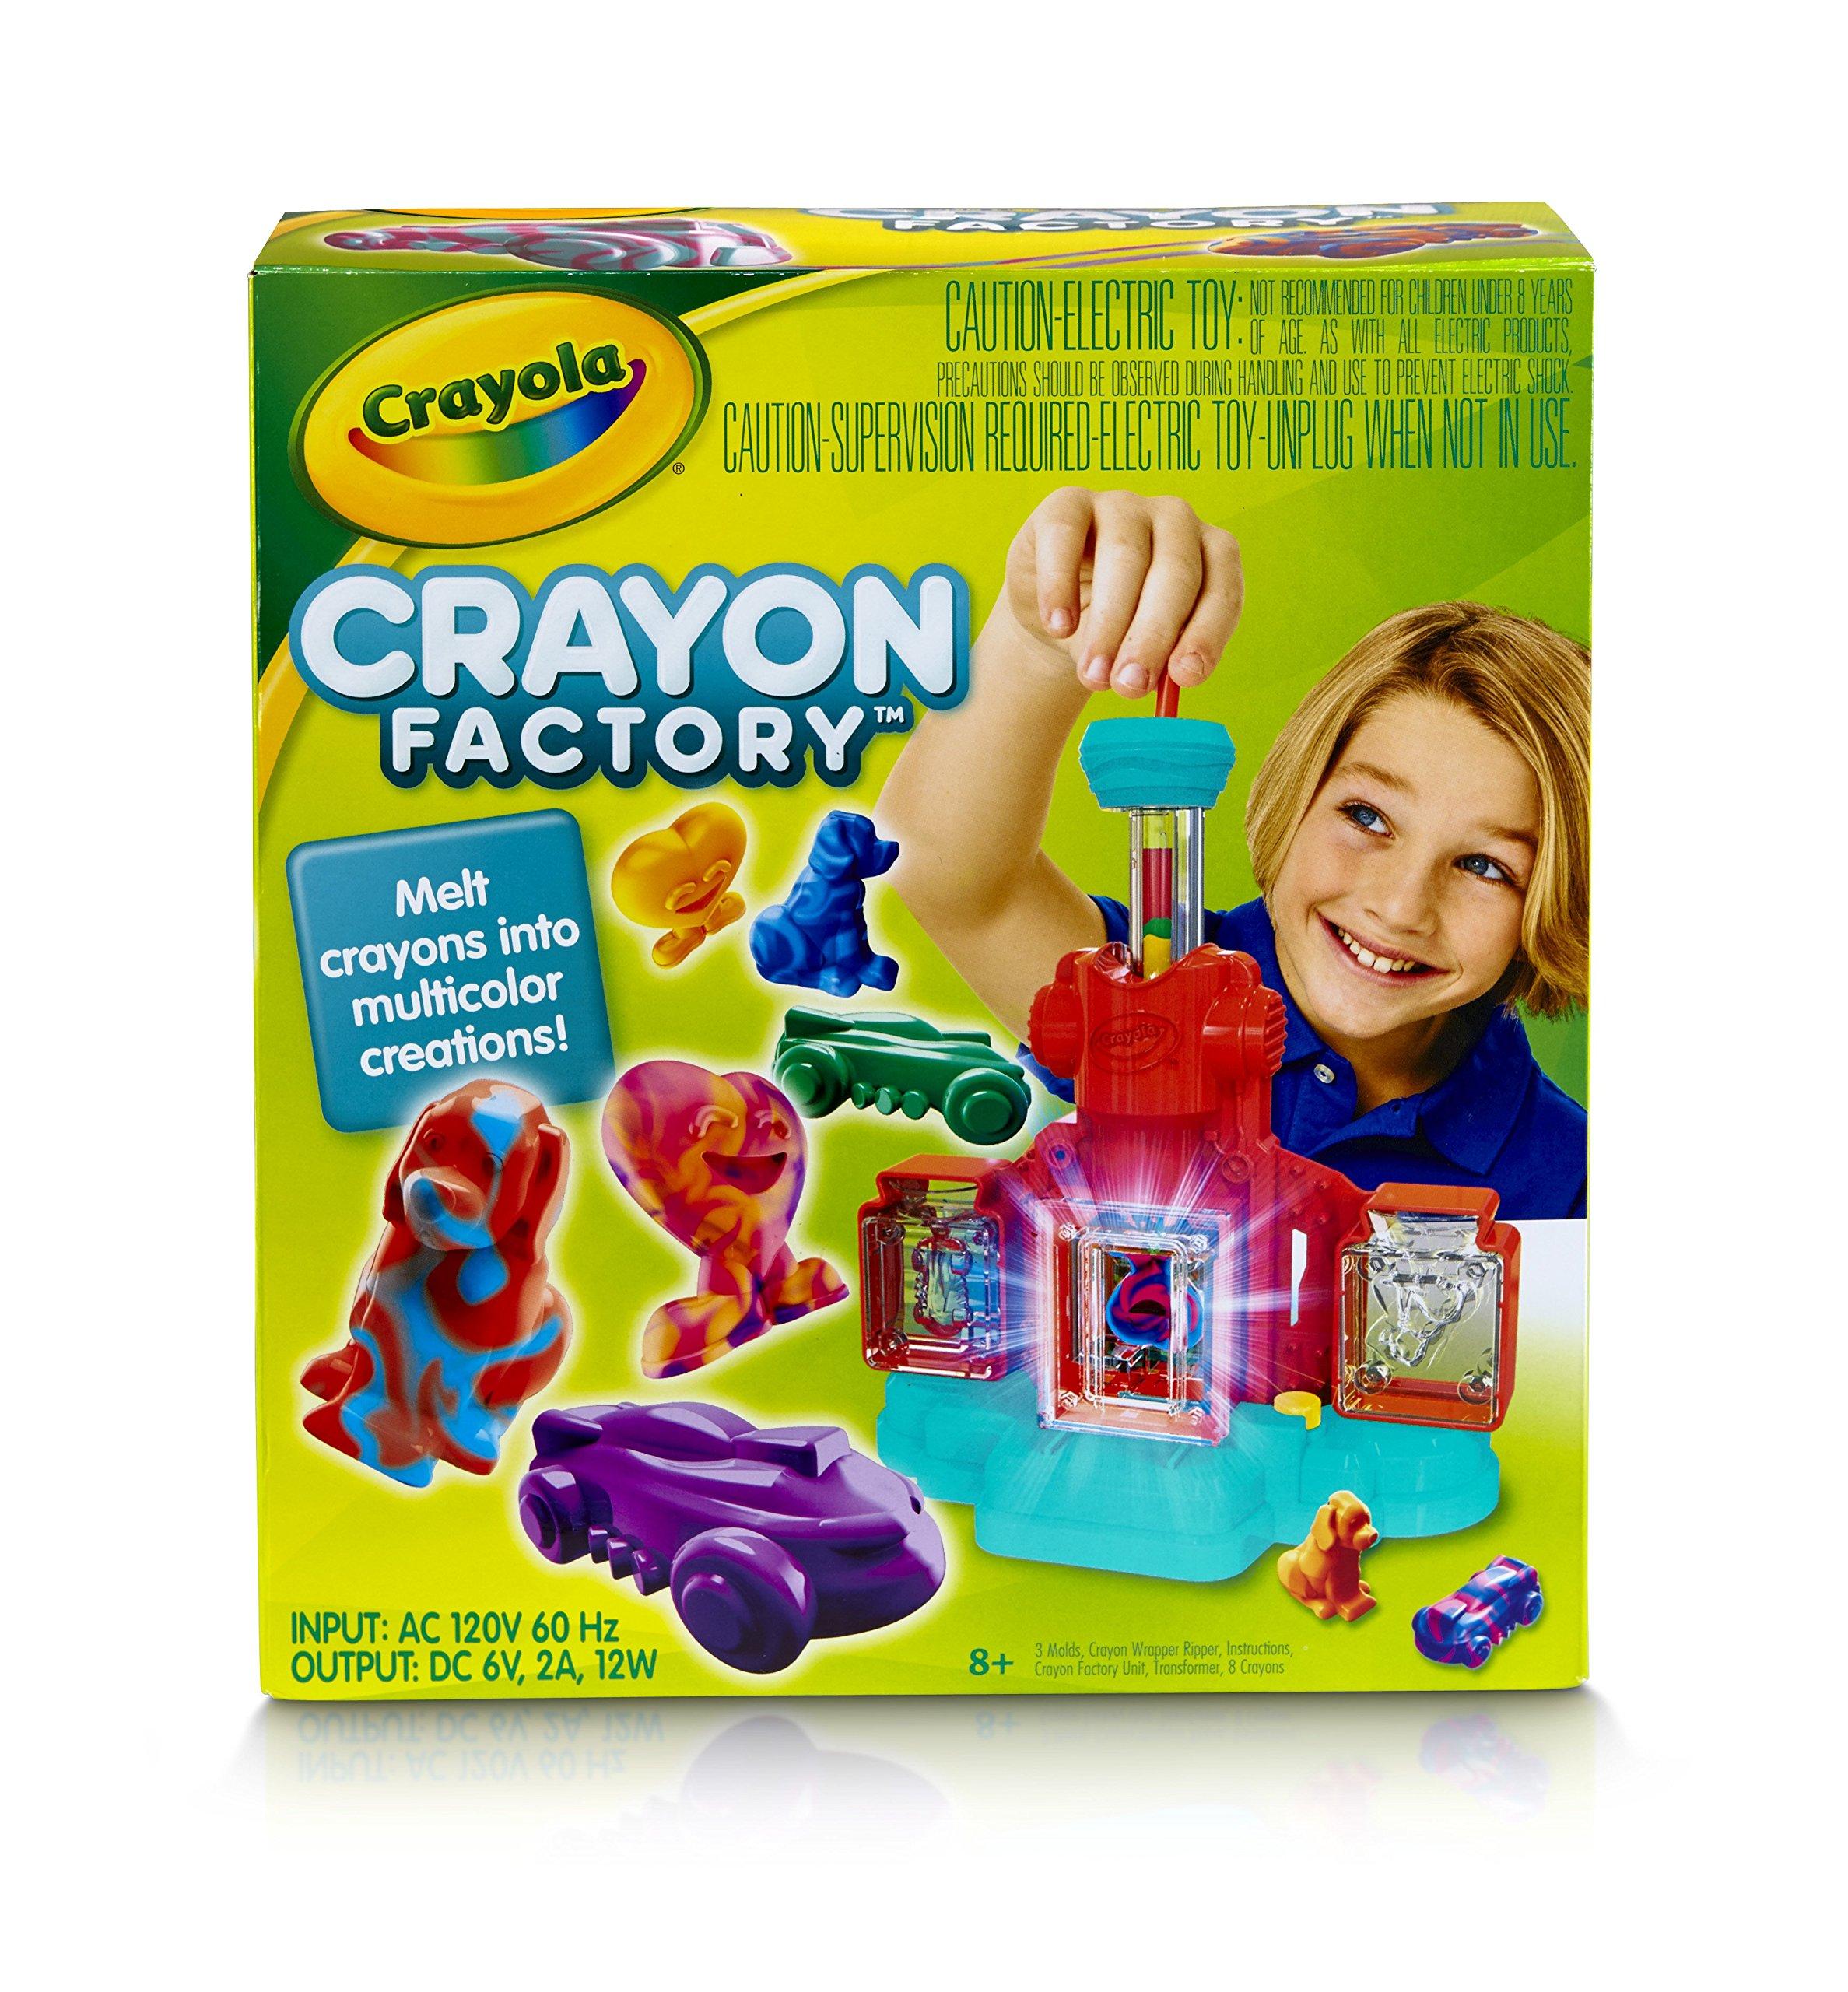 Crayola; Crayon Factory; Art Tool; Electronic; Melt and Mold Crayon Bits into Custom Creations